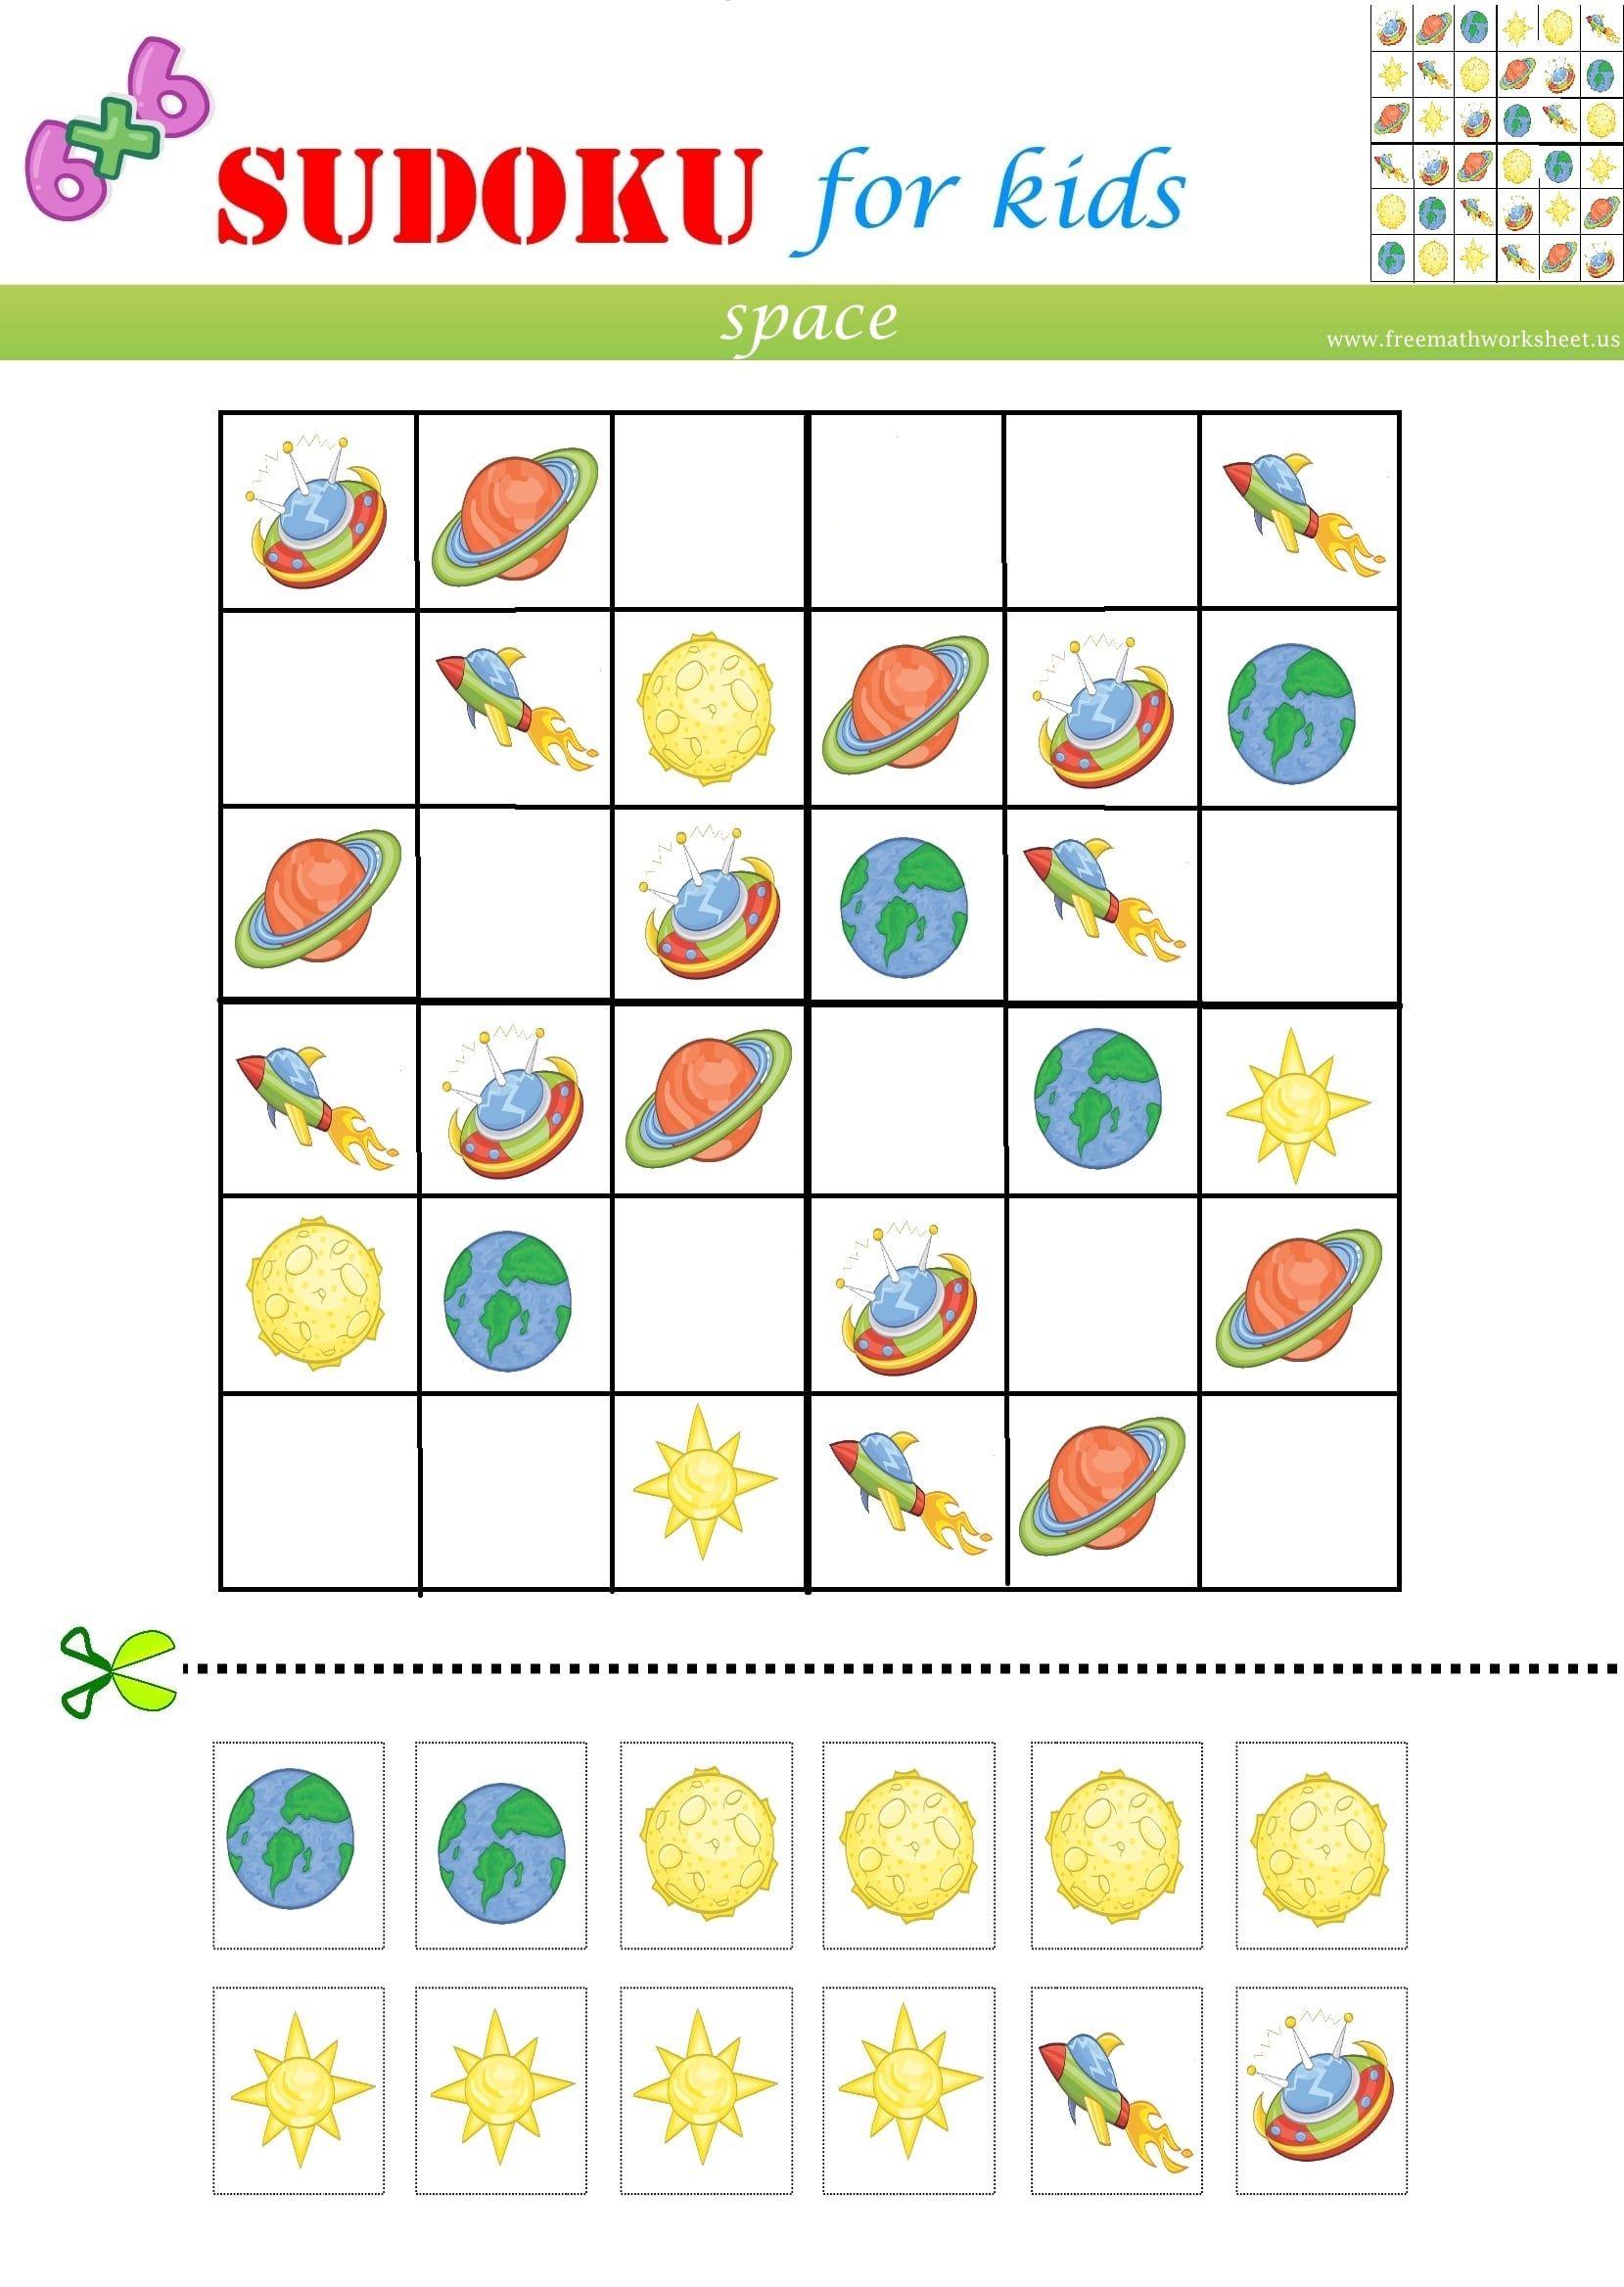 Space Sudoku